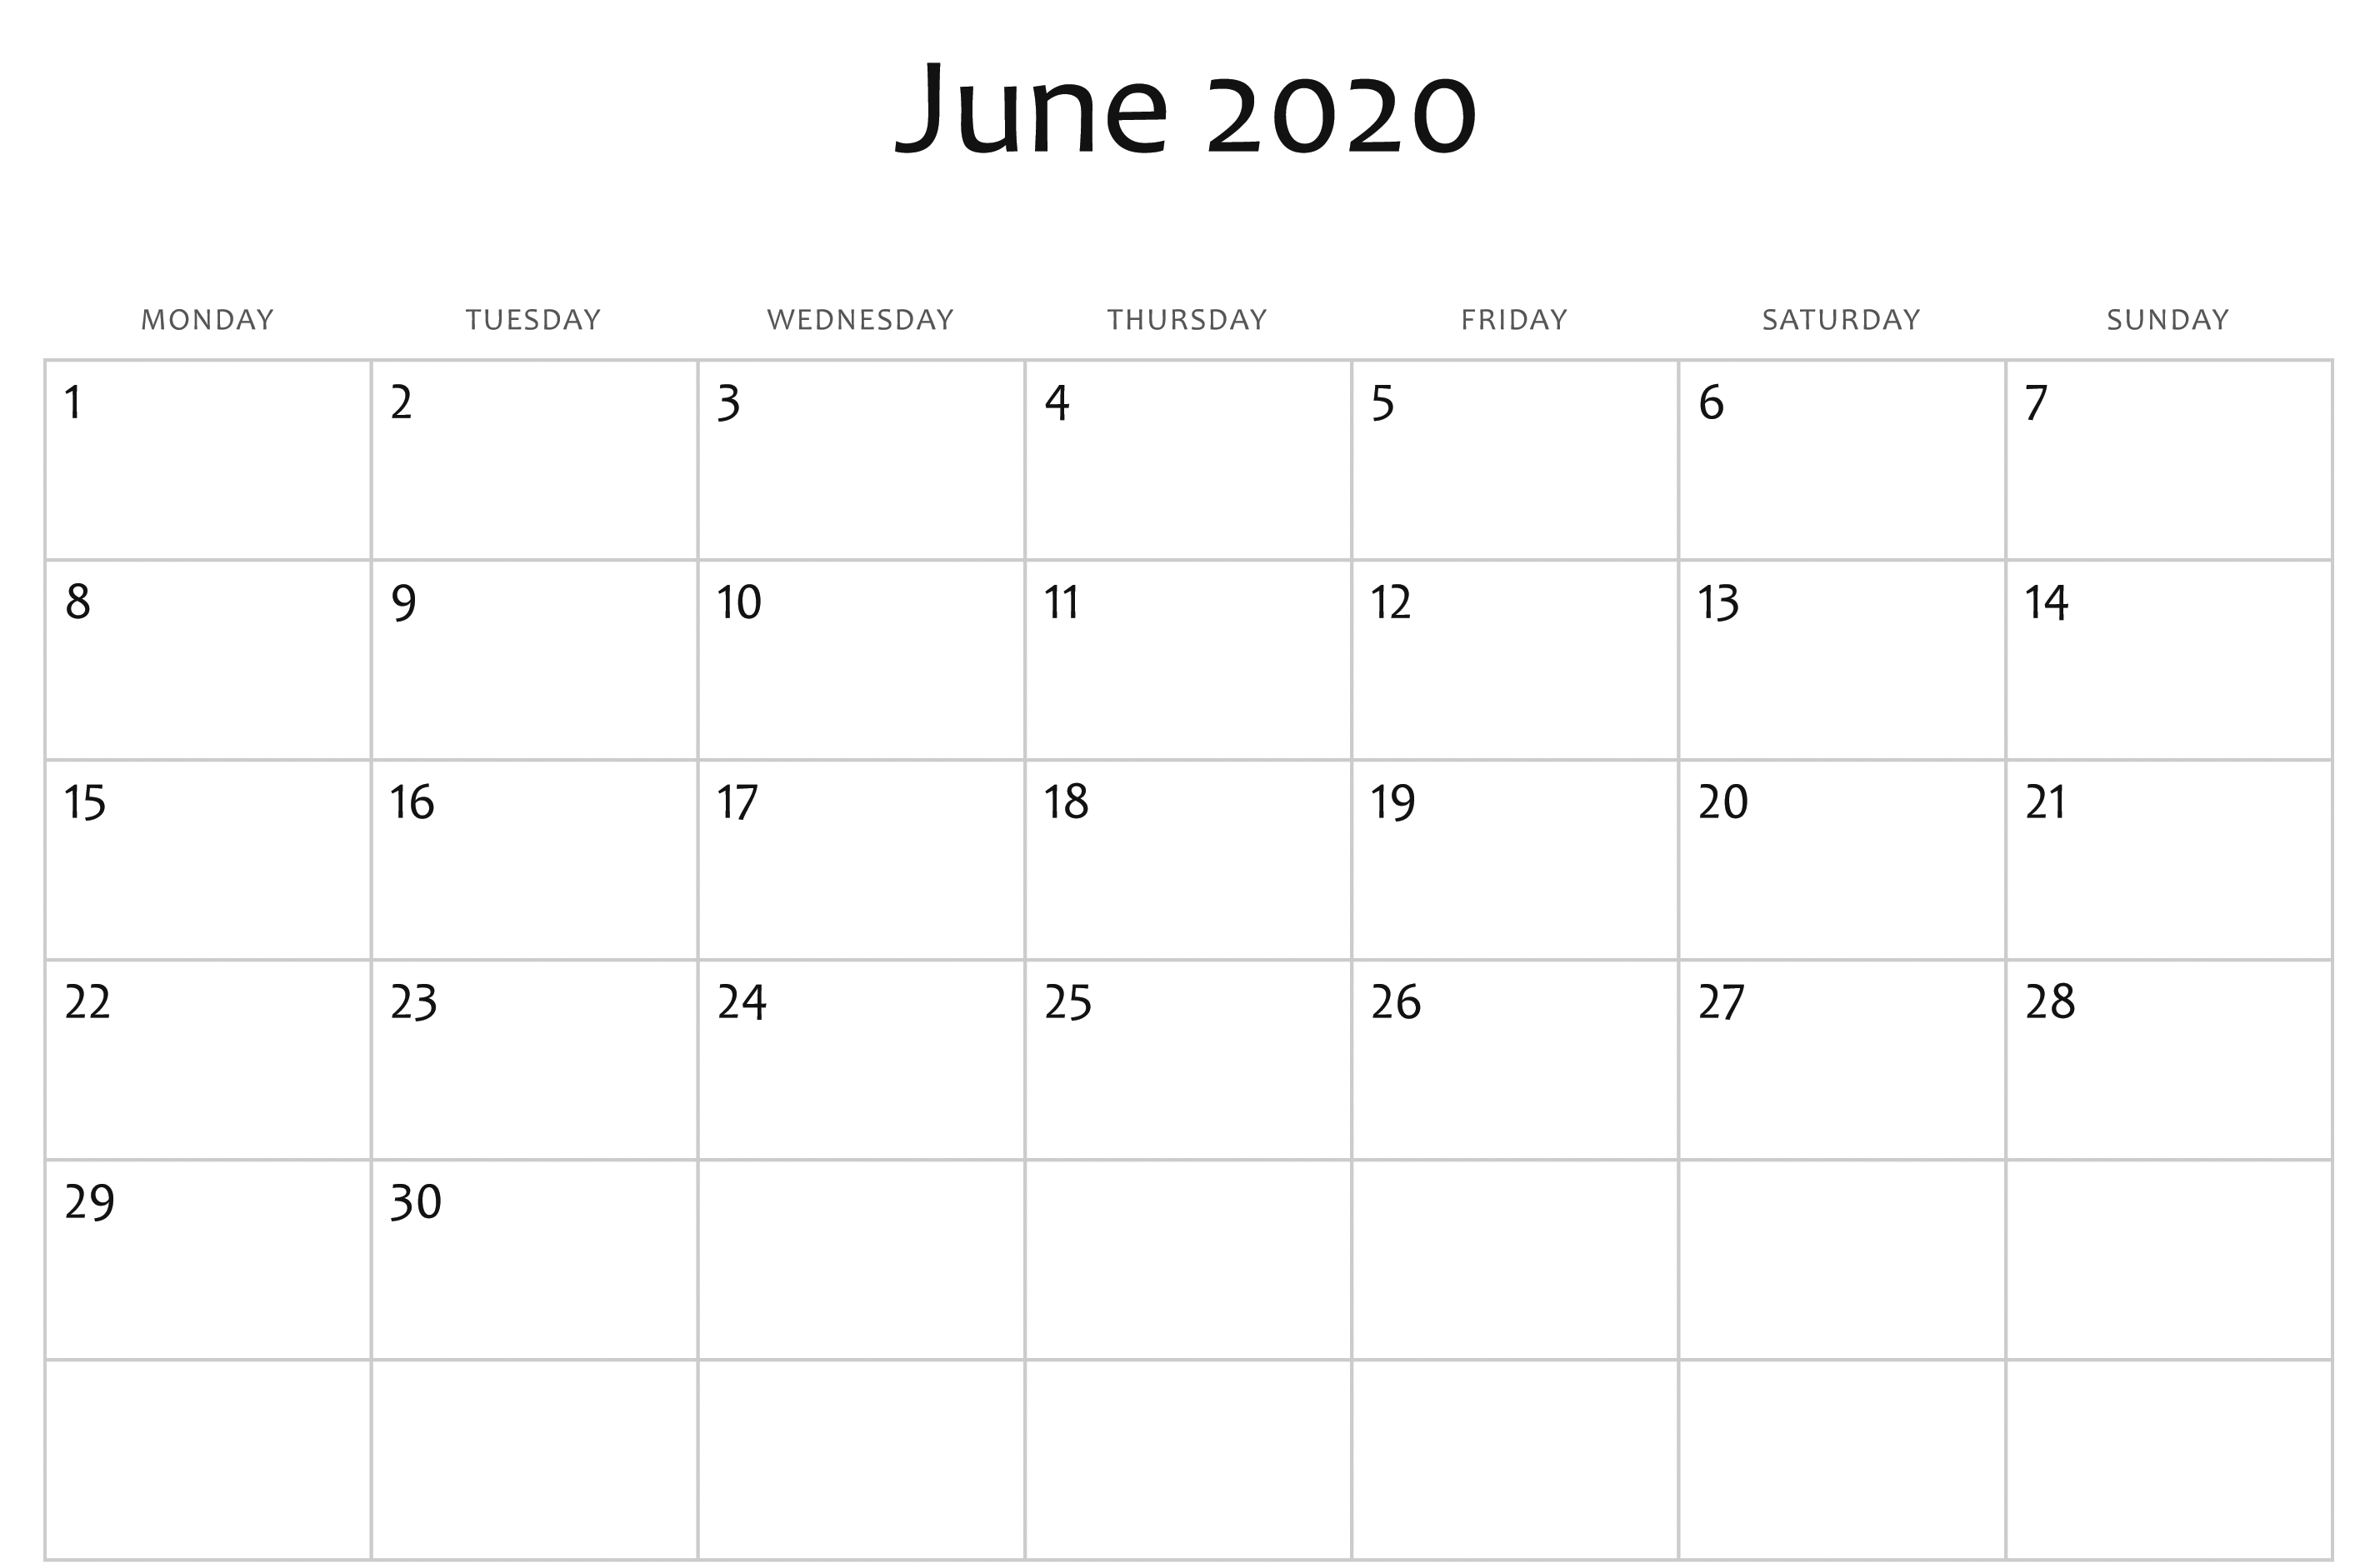 June 2020 Calendar Pdf, Word, Excel Template | Calendar